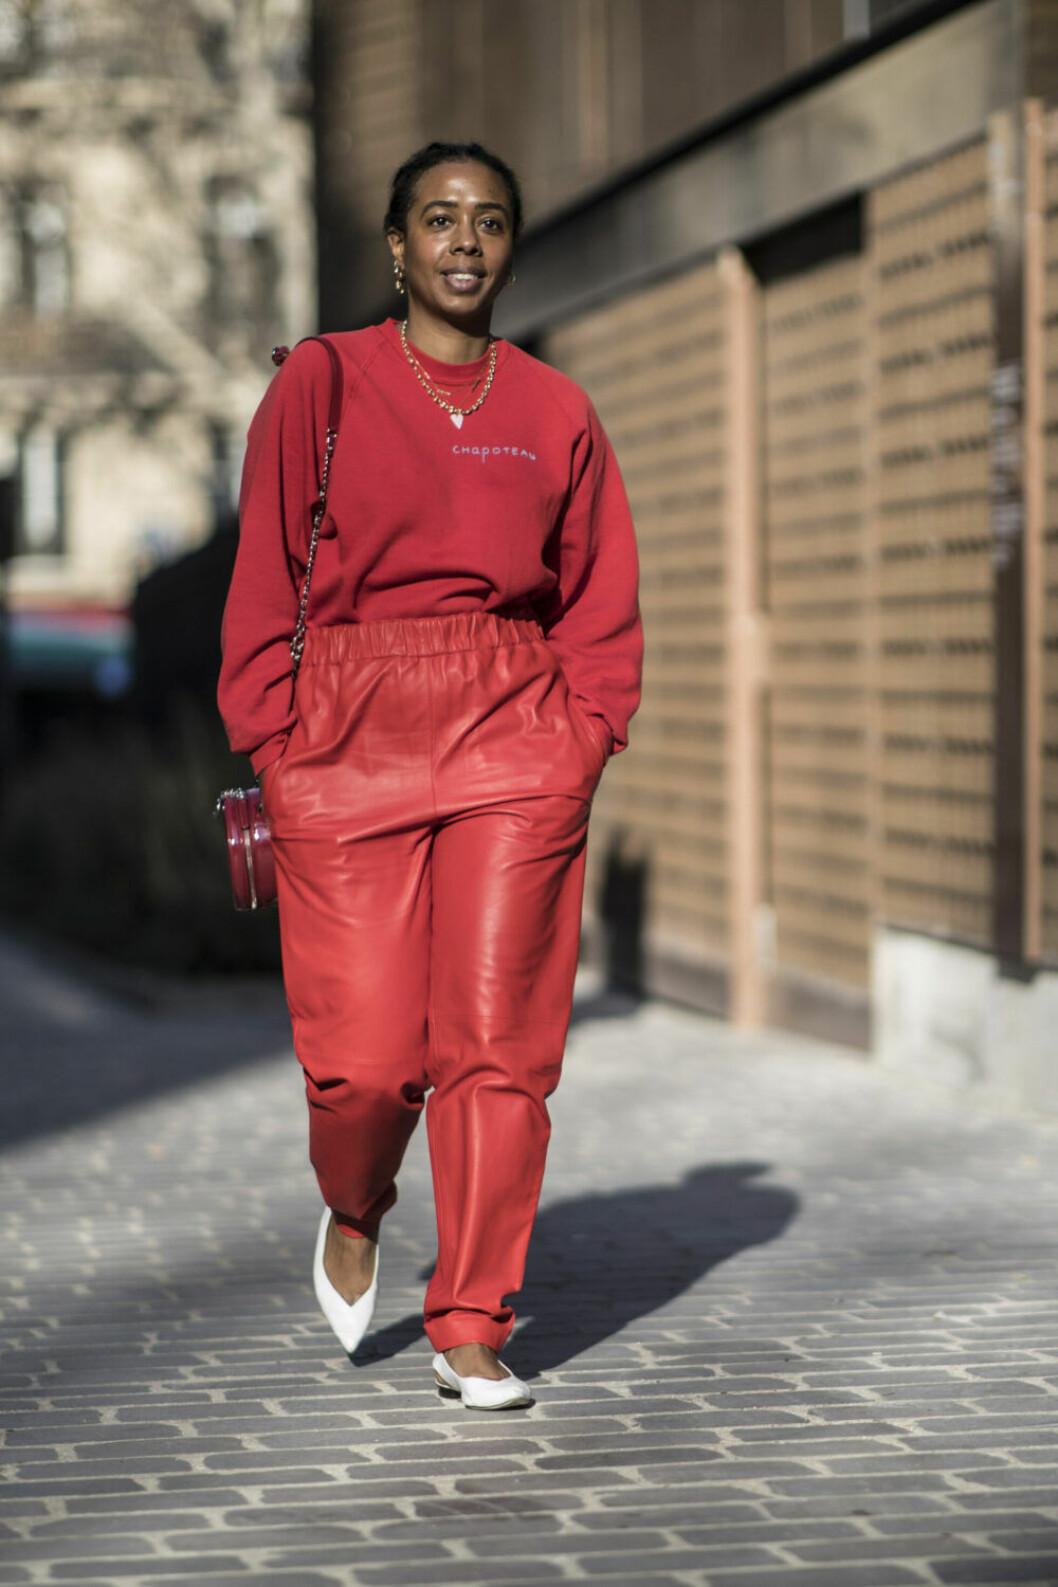 Streetstyle Paris FW, röd outfit.